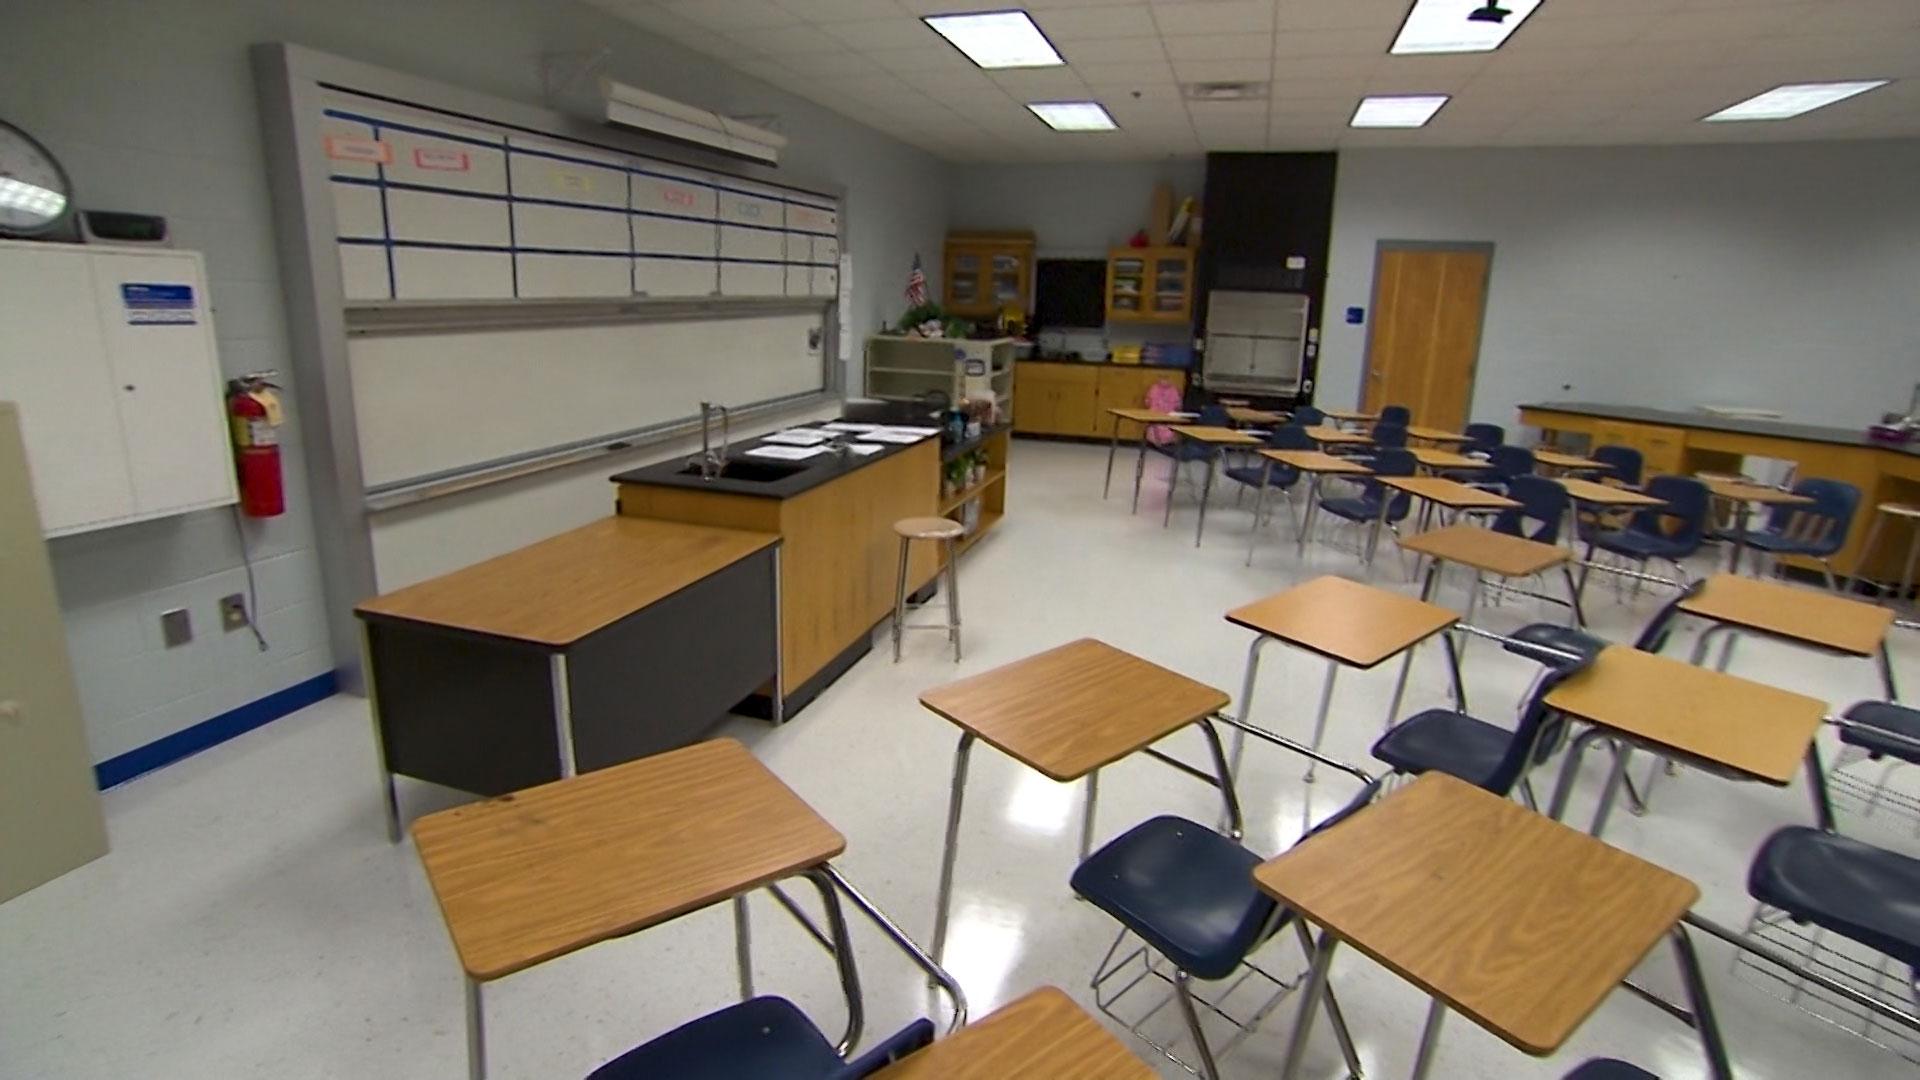 The Coronavirus Crisis Spotlights The Inequalities In American Education